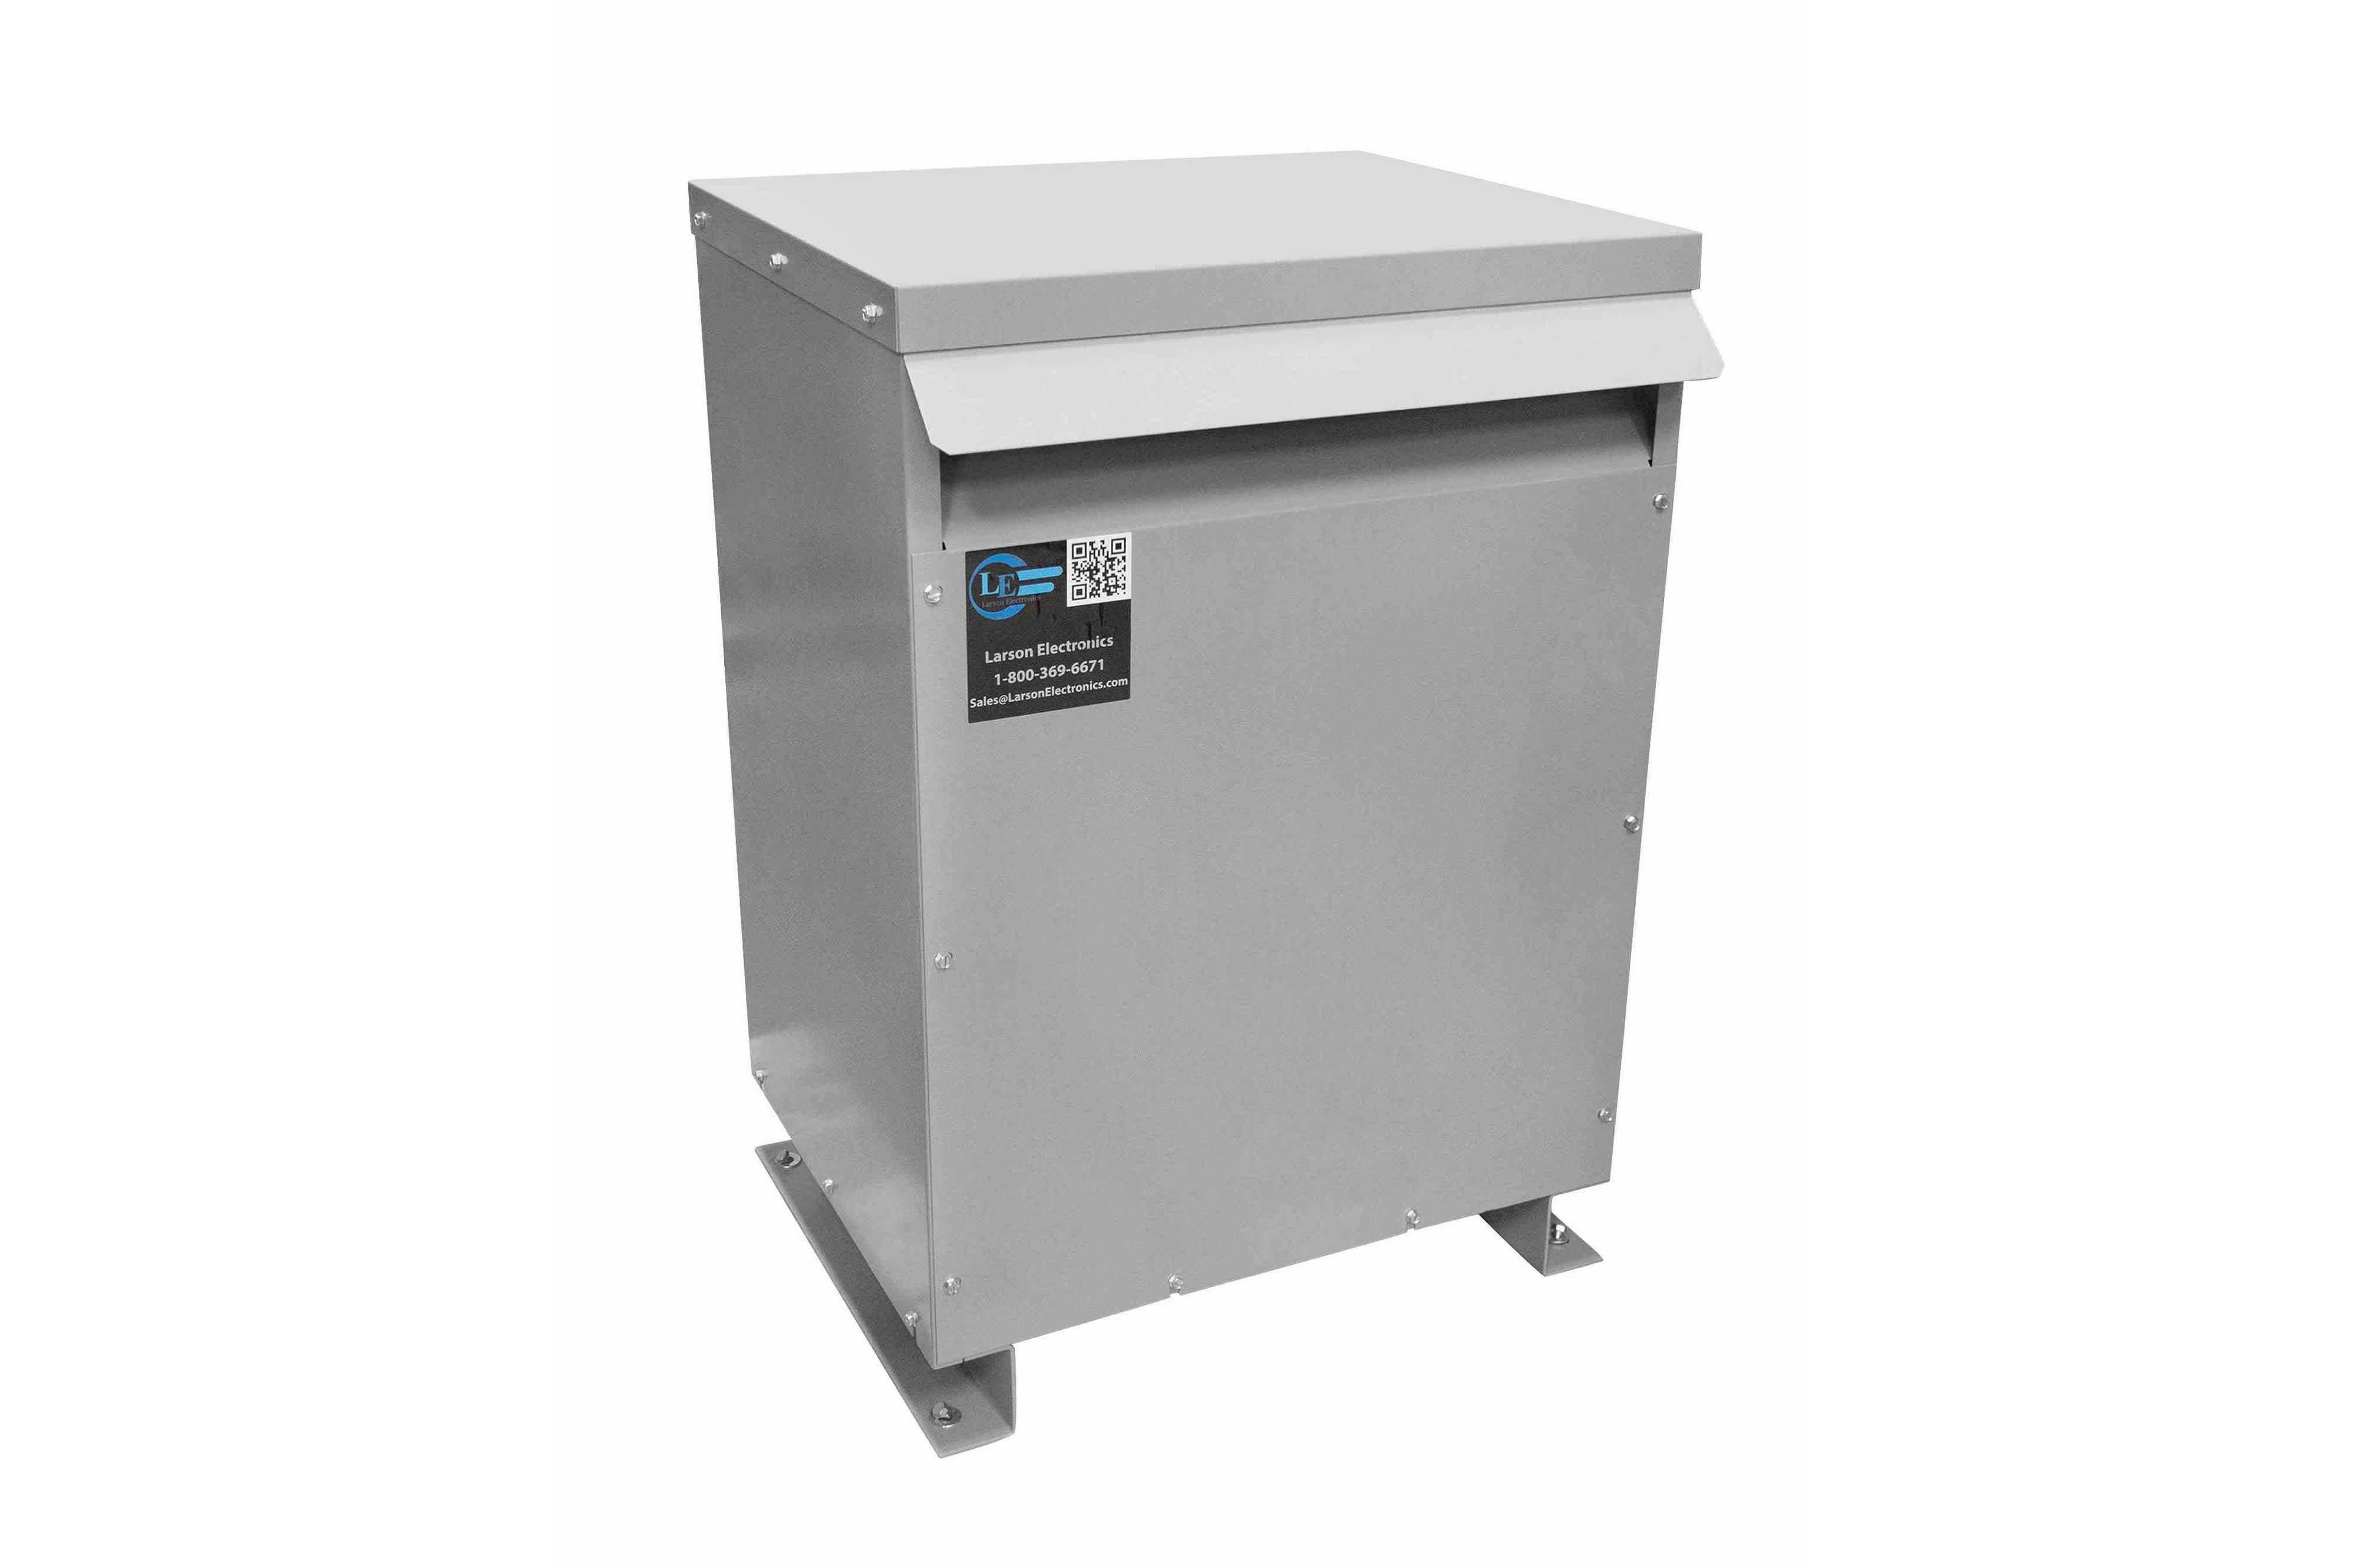 52.5 kVA 3PH Isolation Transformer, 600V Wye Primary, 460Y/266 Wye-N Secondary, N3R, Ventilated, 60 Hz